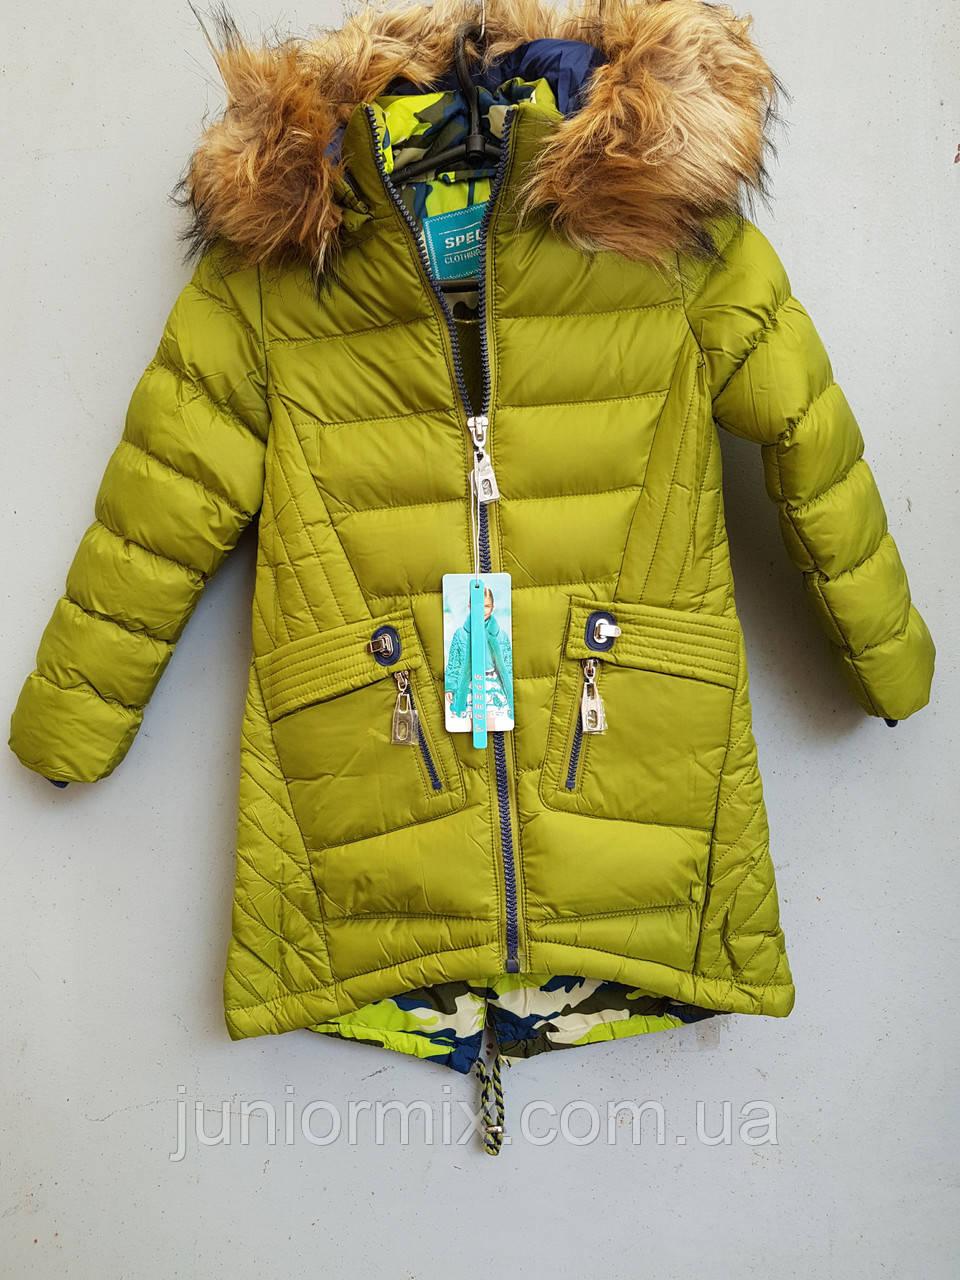 9f5f9bfd51ef Куртка зимняя на девочку SPEED.A Зажим салатовый